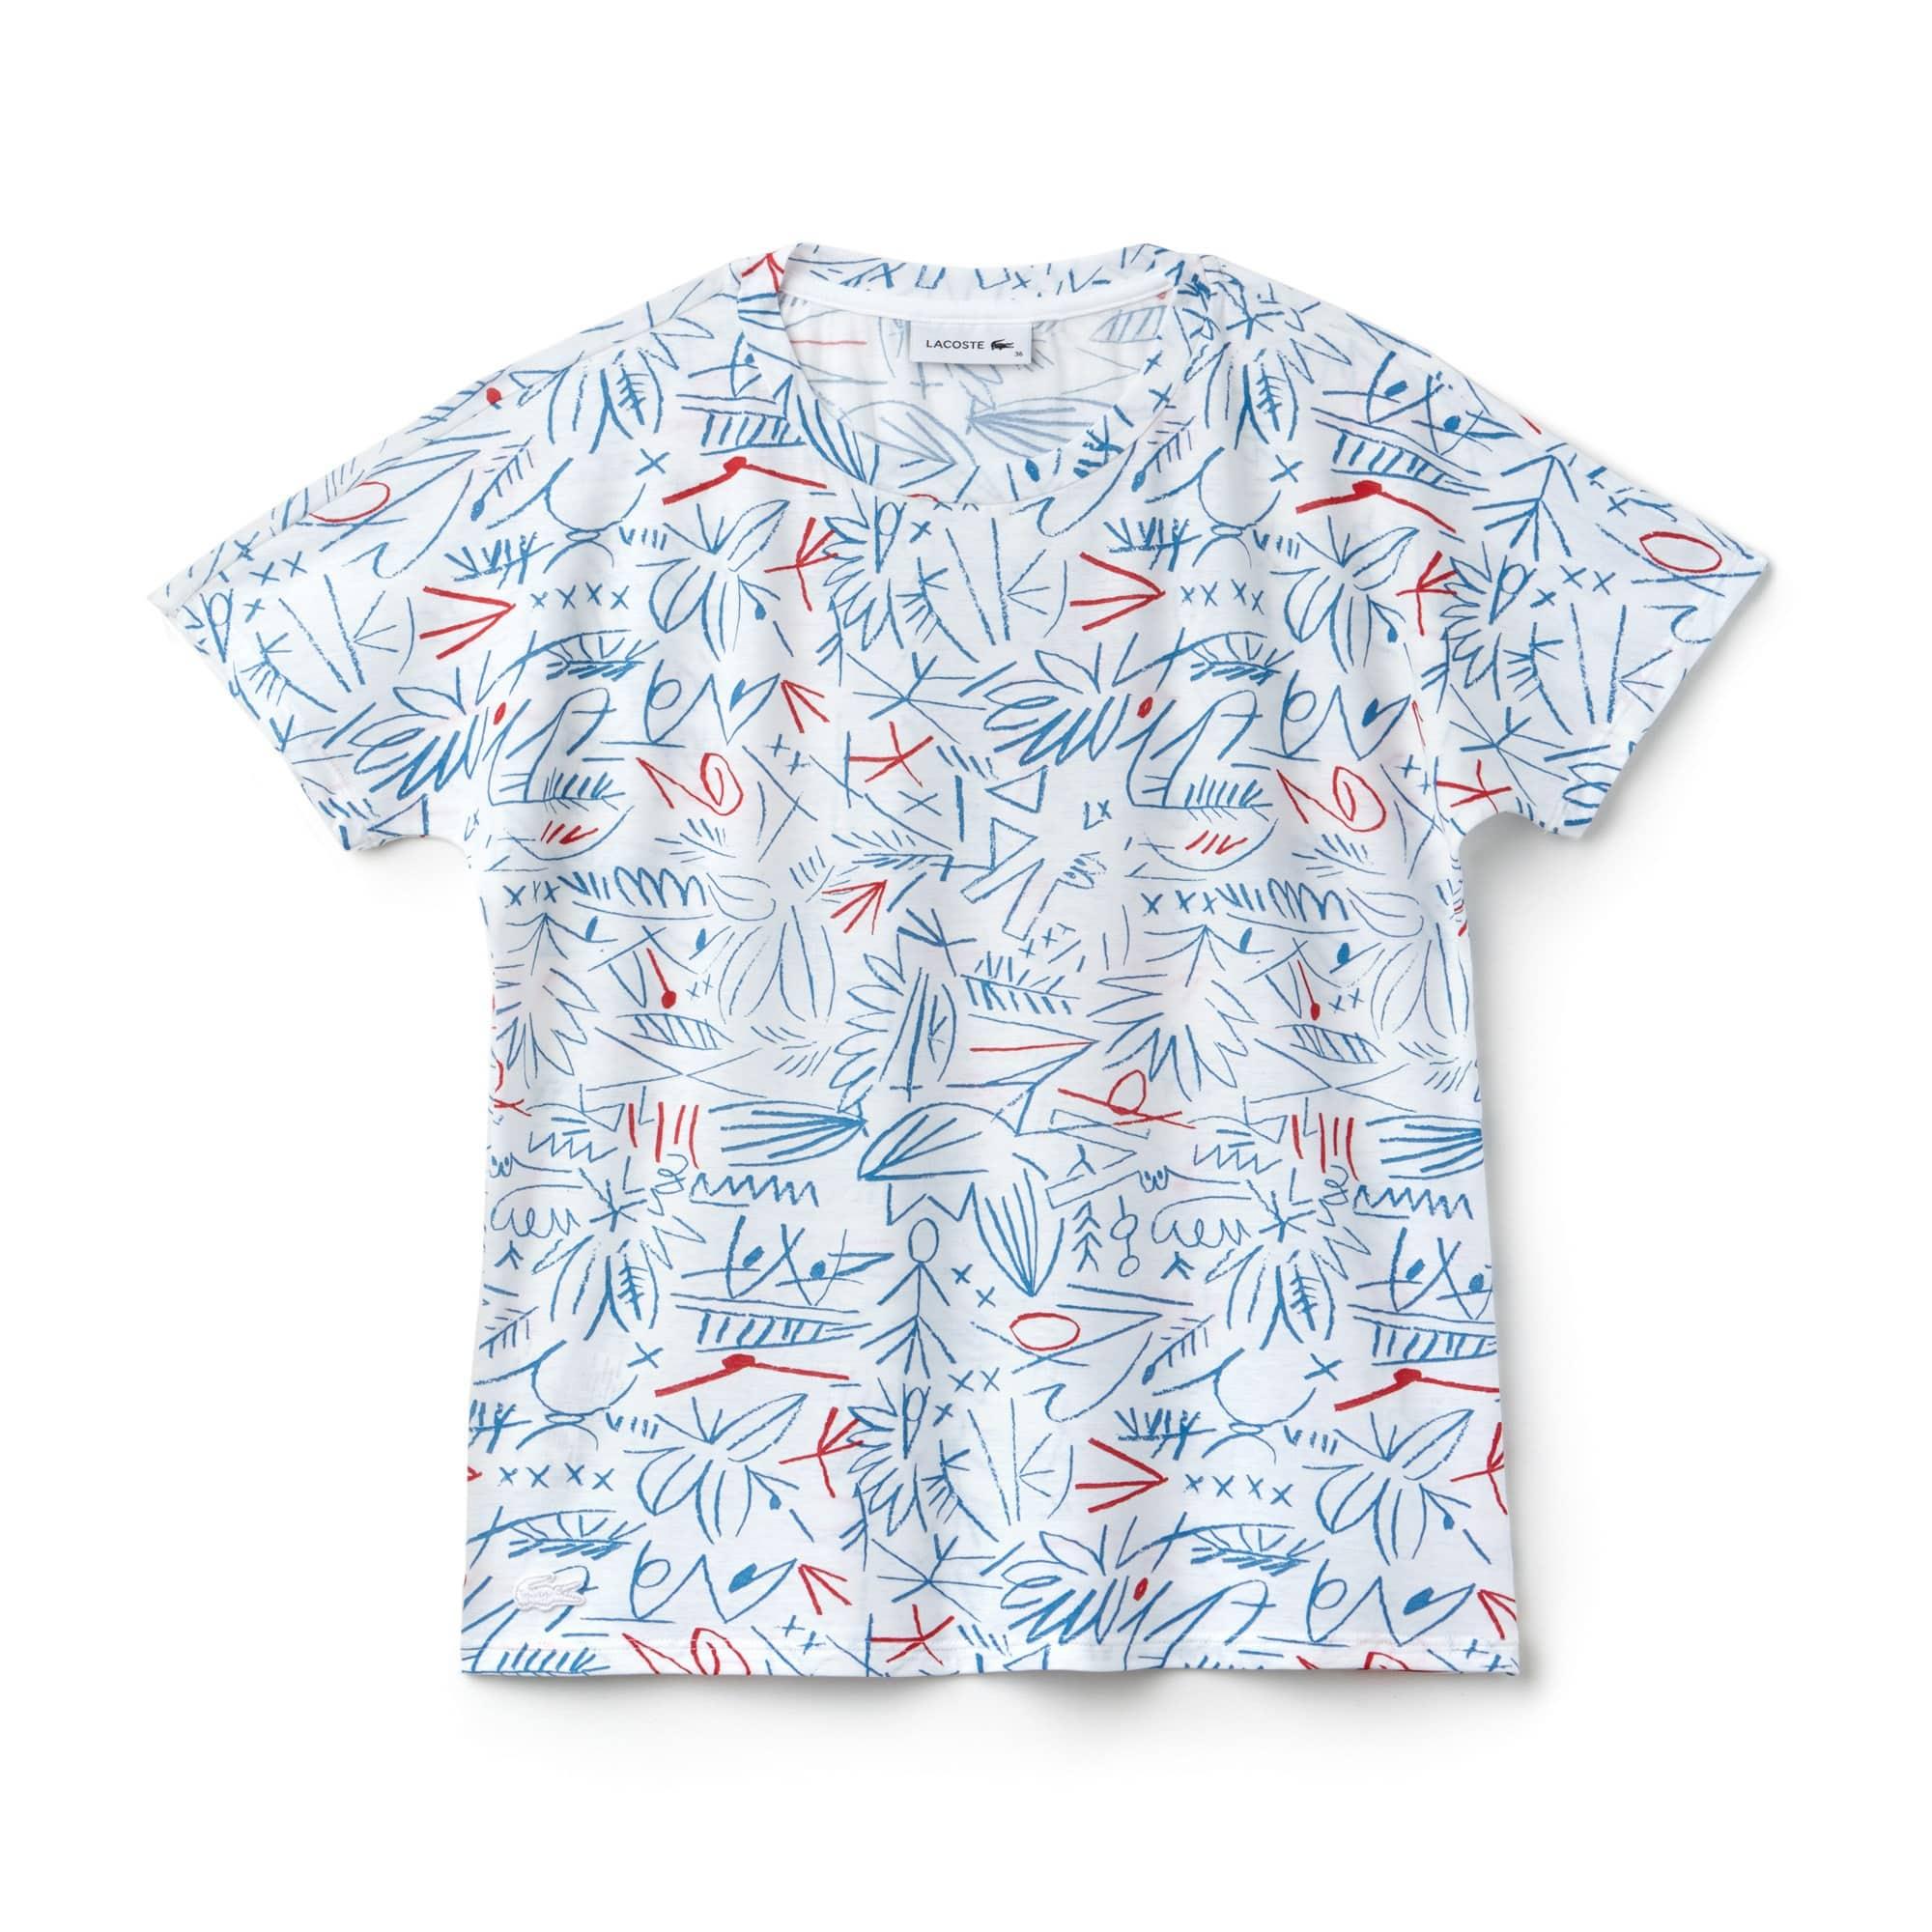 Women's Crew Neck Print Cotton Crepe Jersey T-shirt